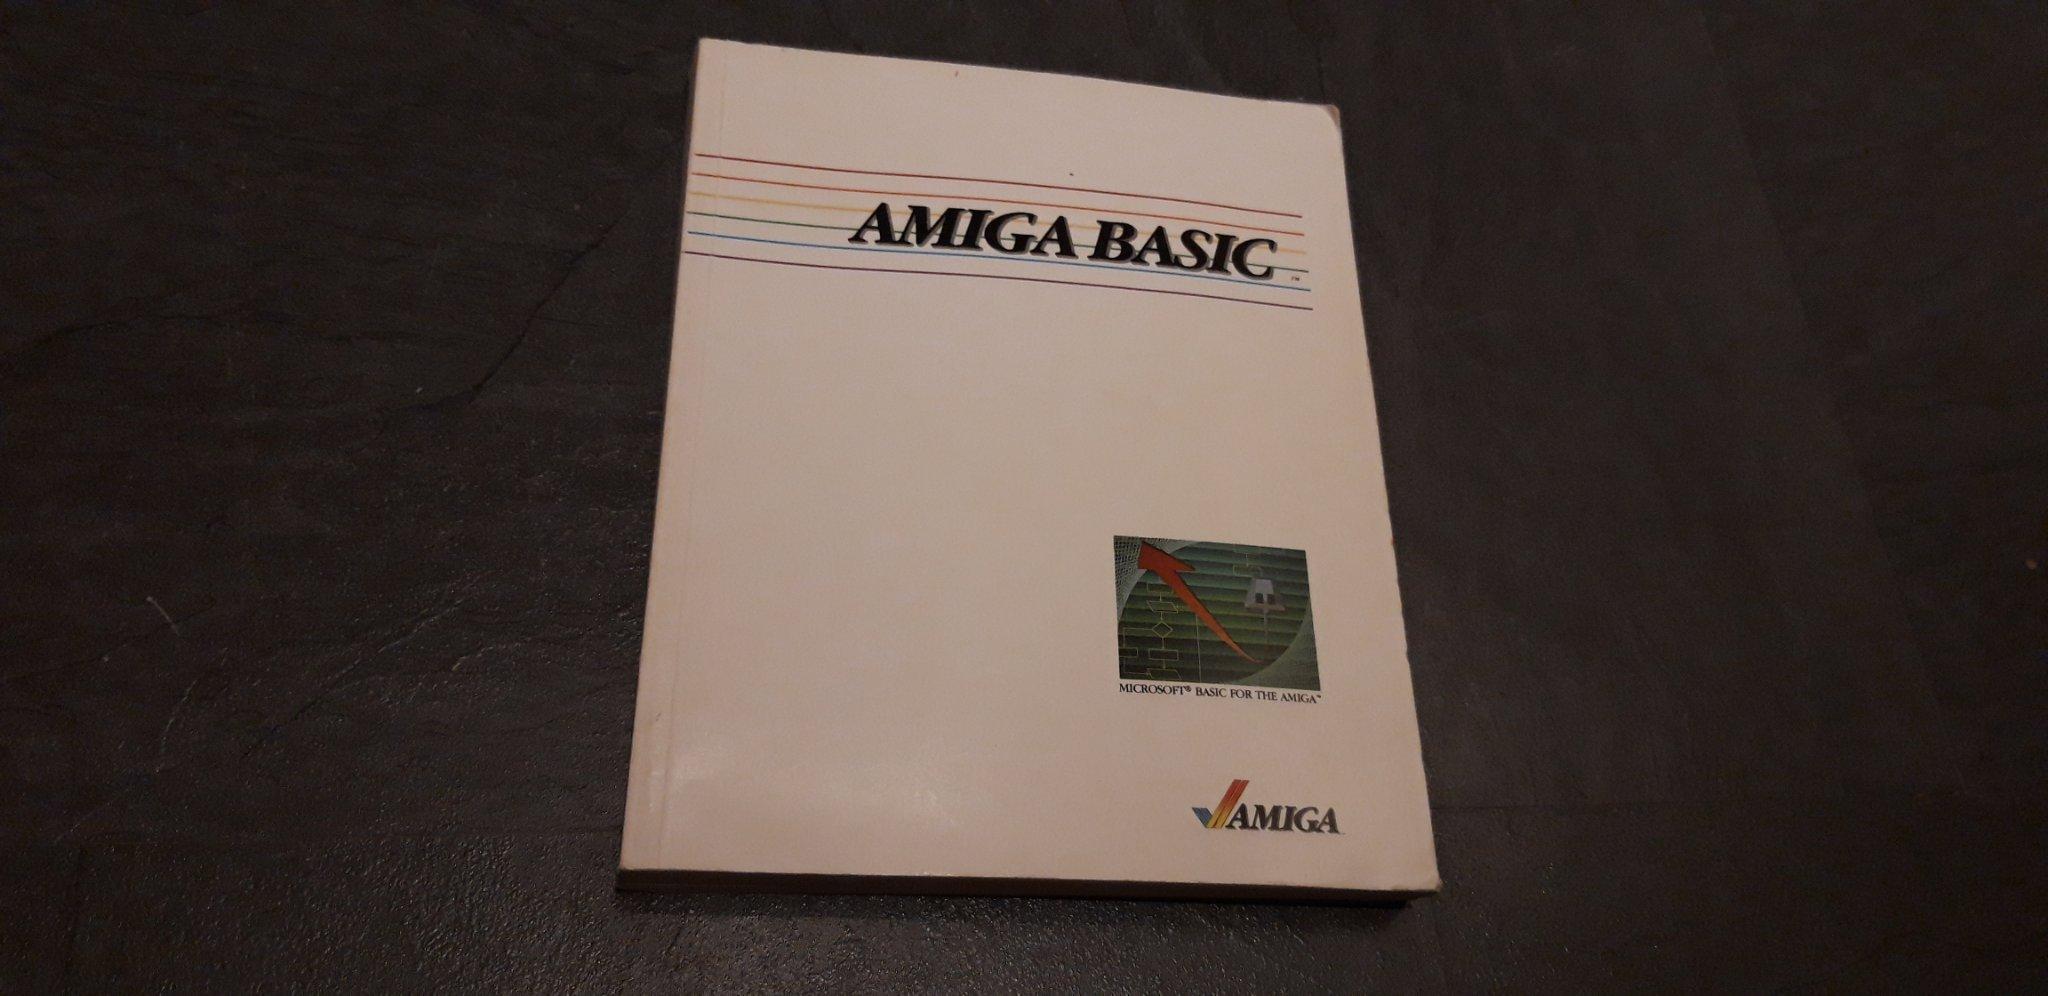 Amiga Abasic